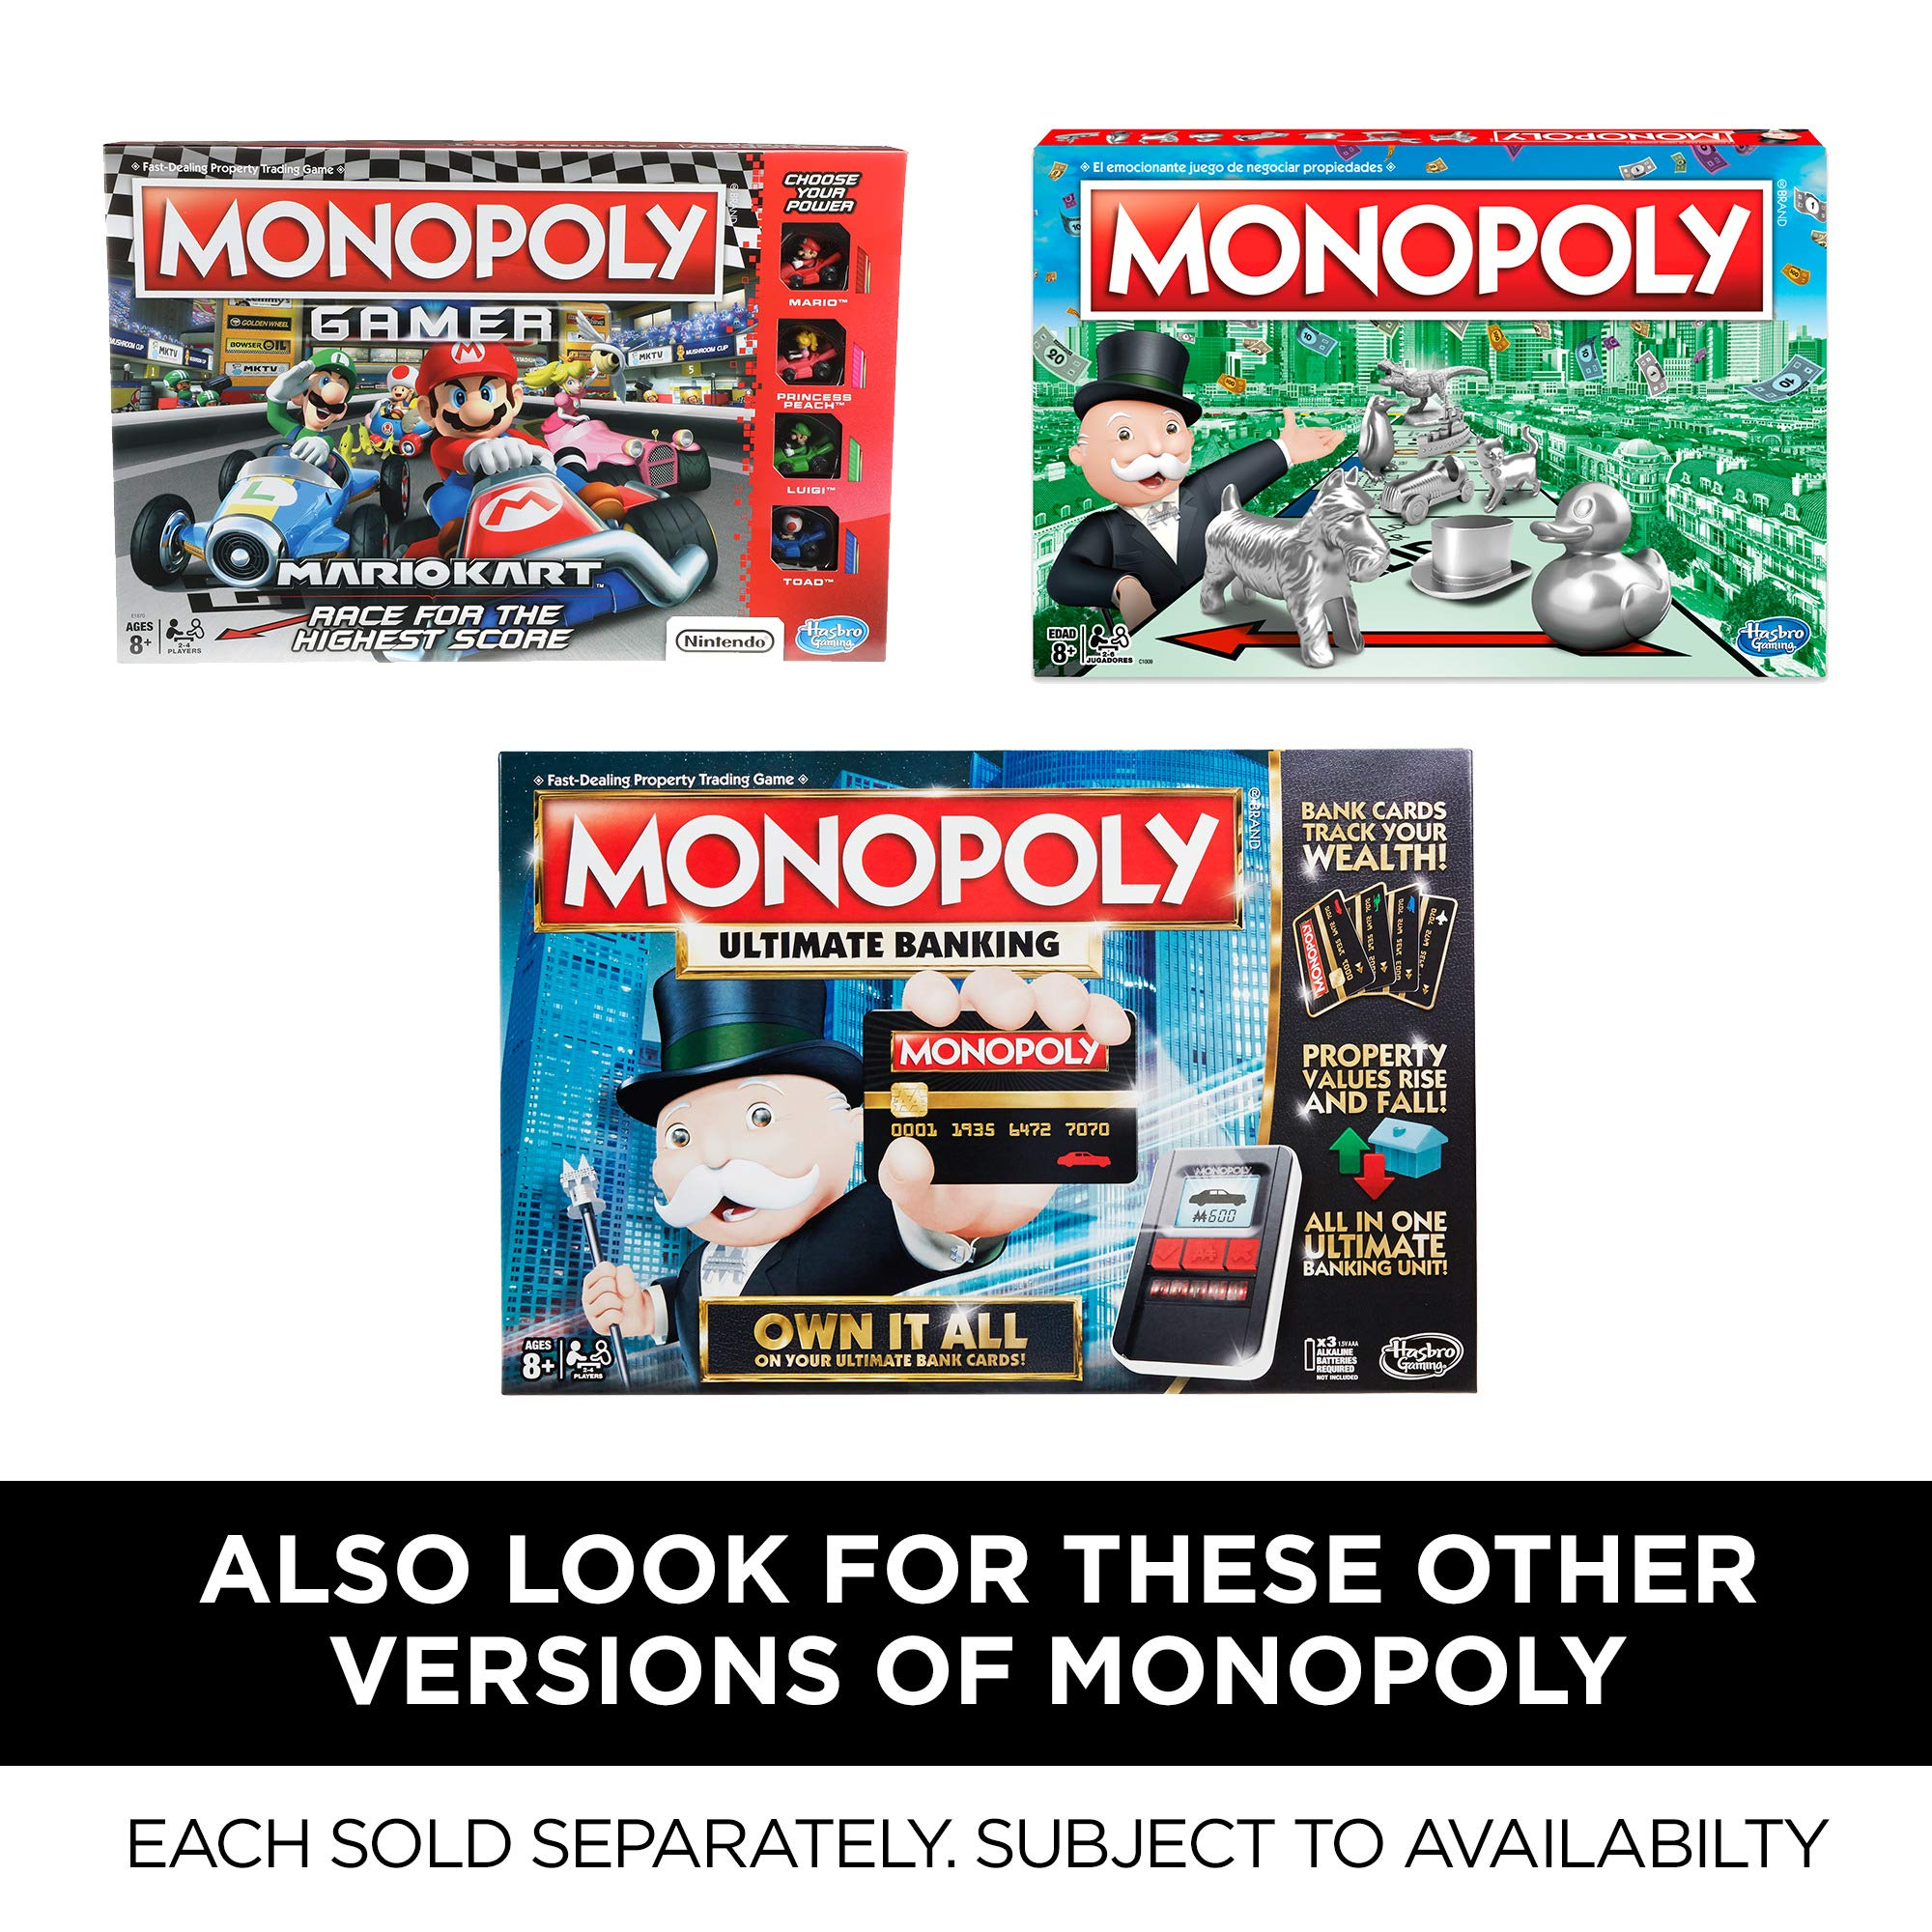 MONOPOLY CHEATERS /E: Amazon.es: Libros en idiomas extranjeros